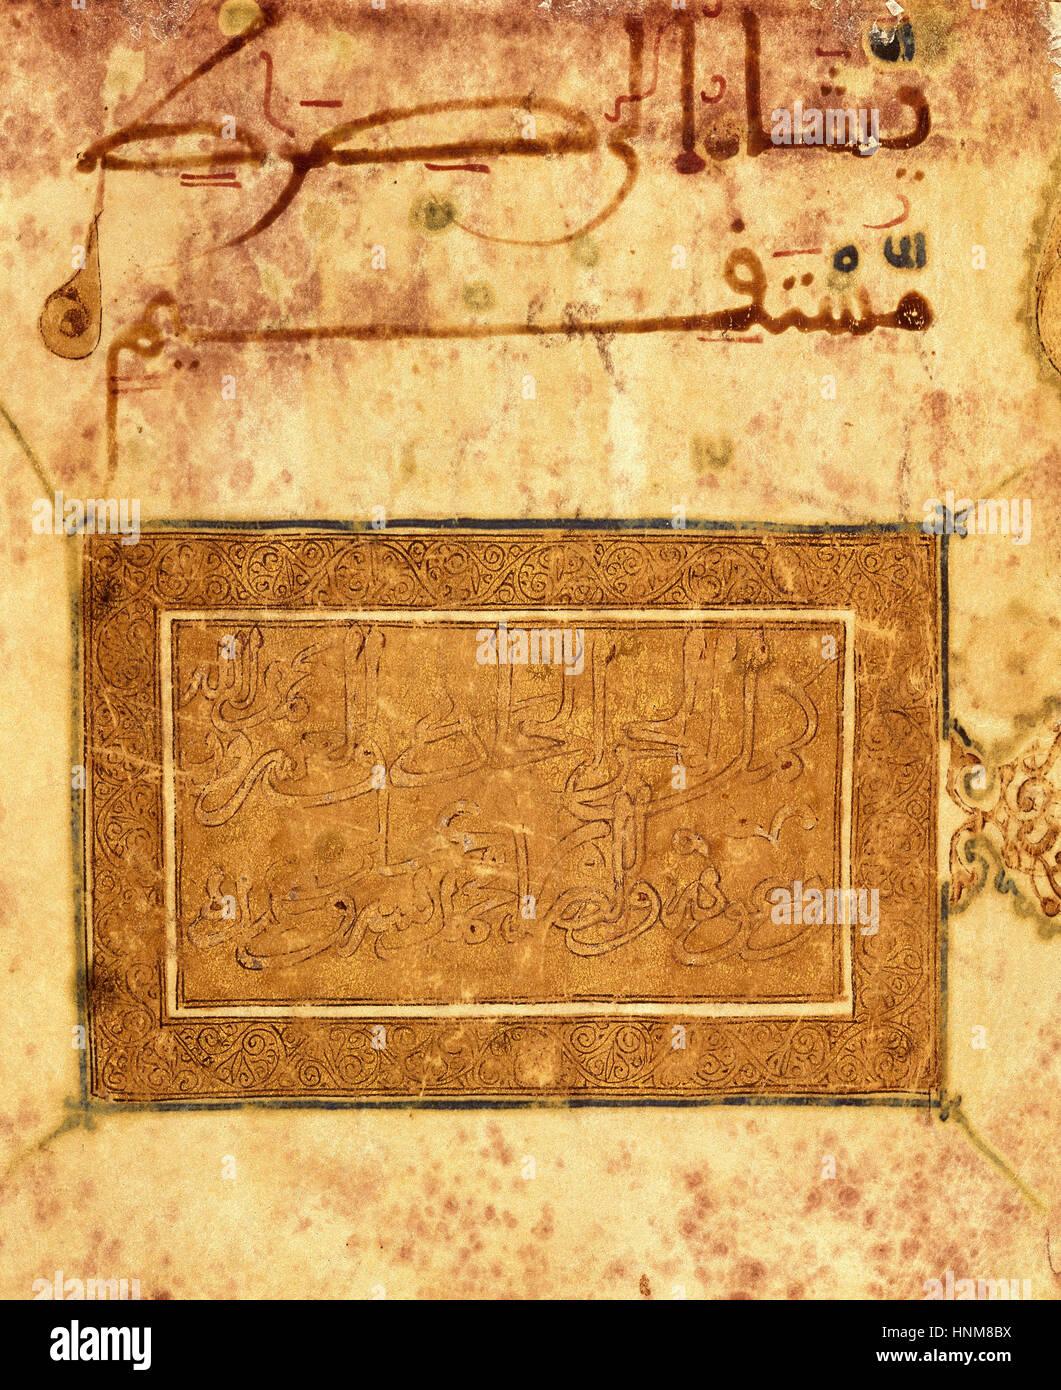 Arabic Koran. 14th century. - Stock Image